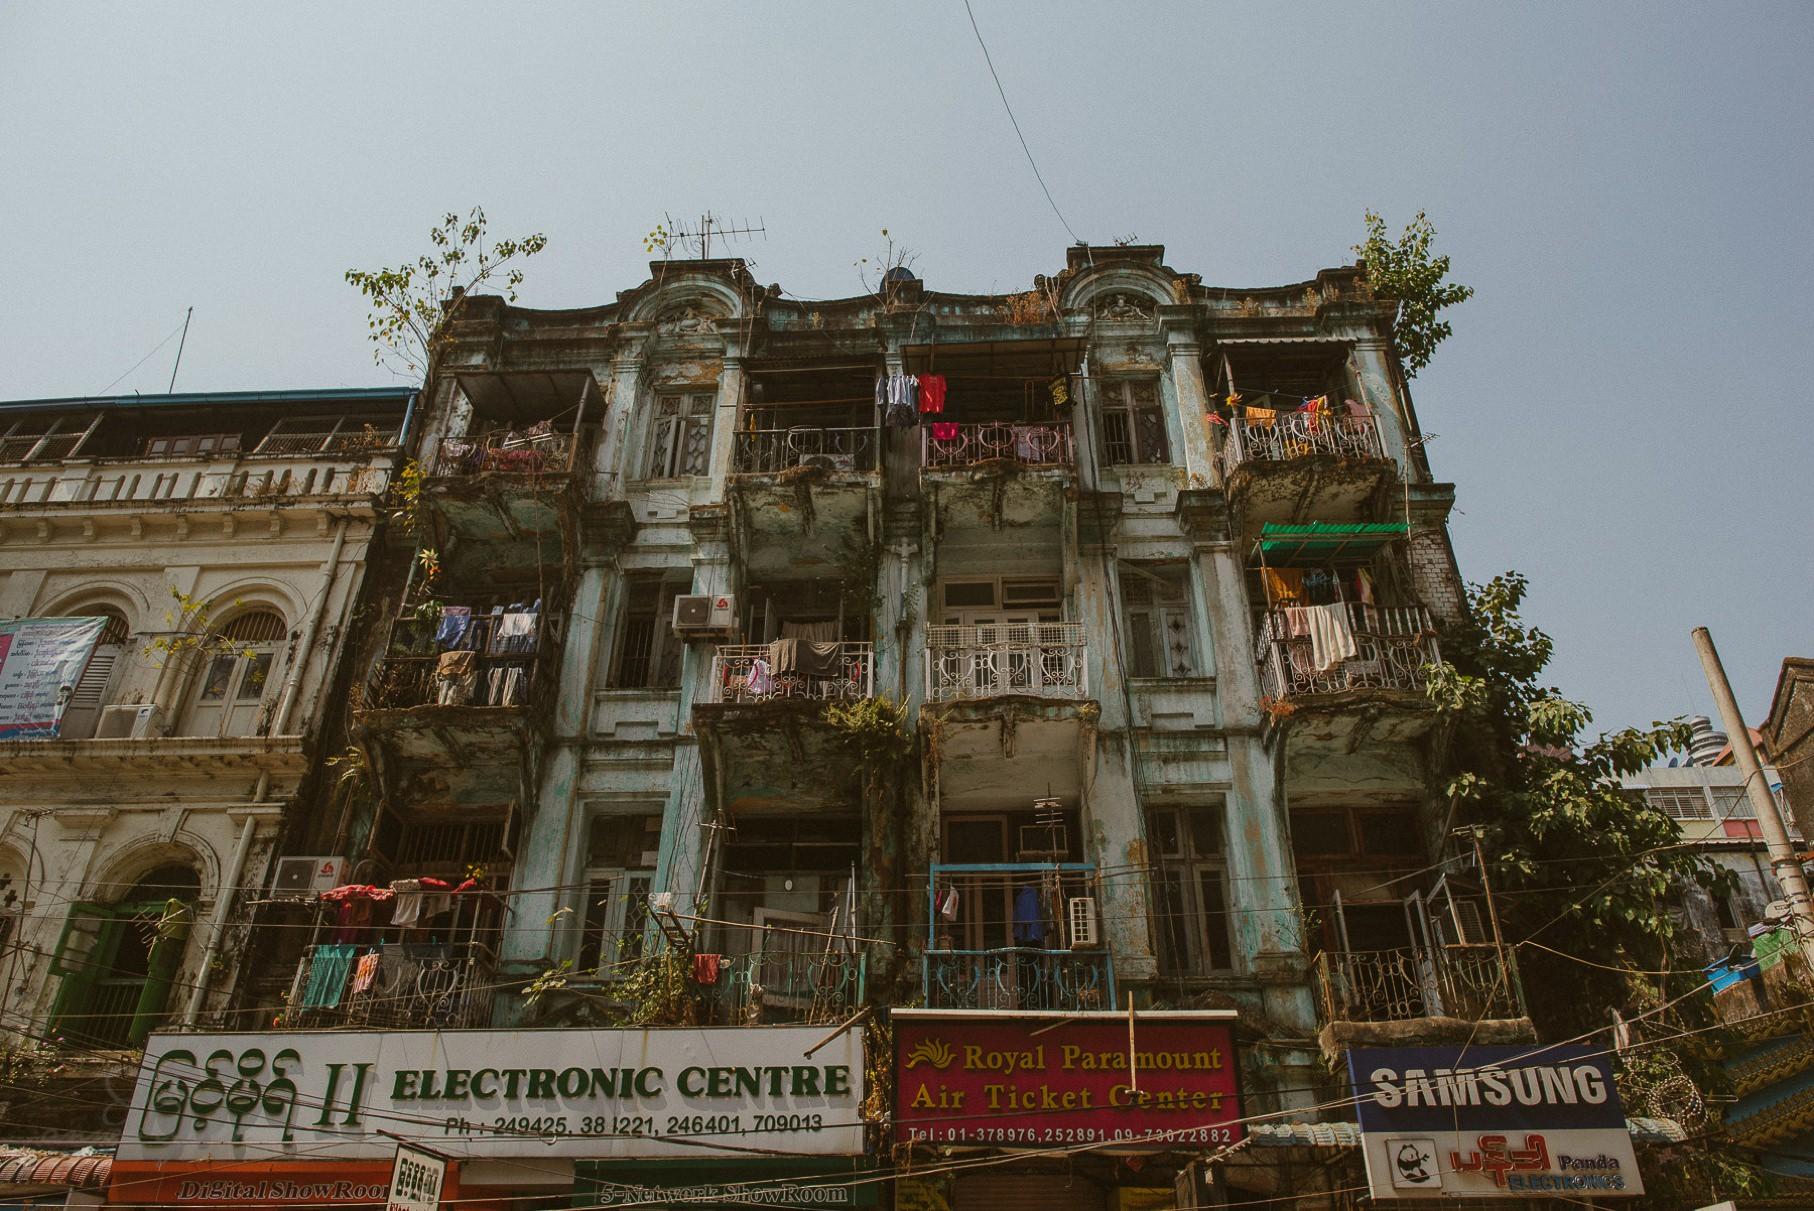 0028 yangon mandalay d76 4780 - Großstädte Myanmars - Yangon & Mandalay